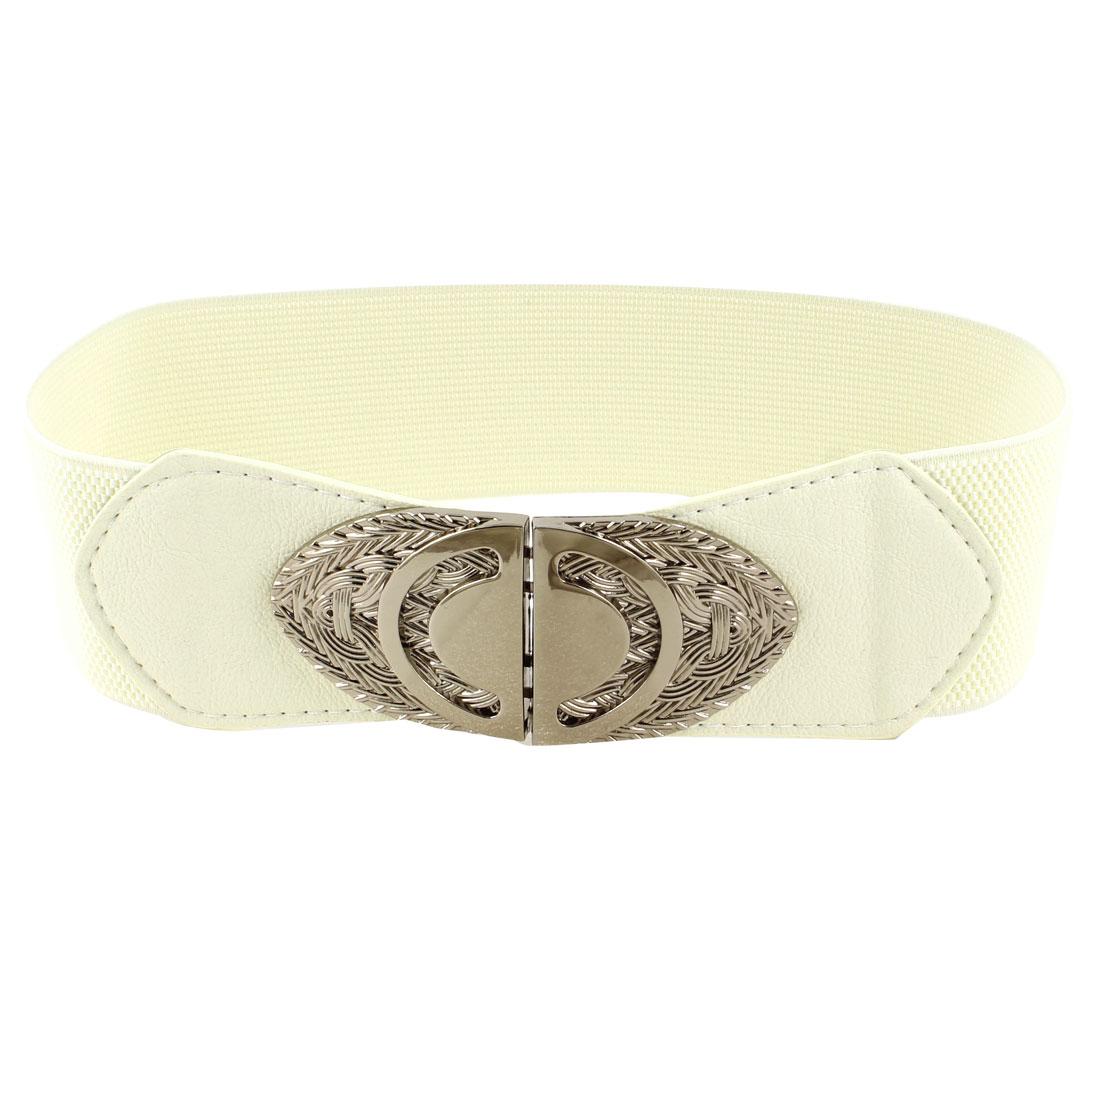 Double D Design Interlock Buckle Stretched Waistbelt Beige for Ladies